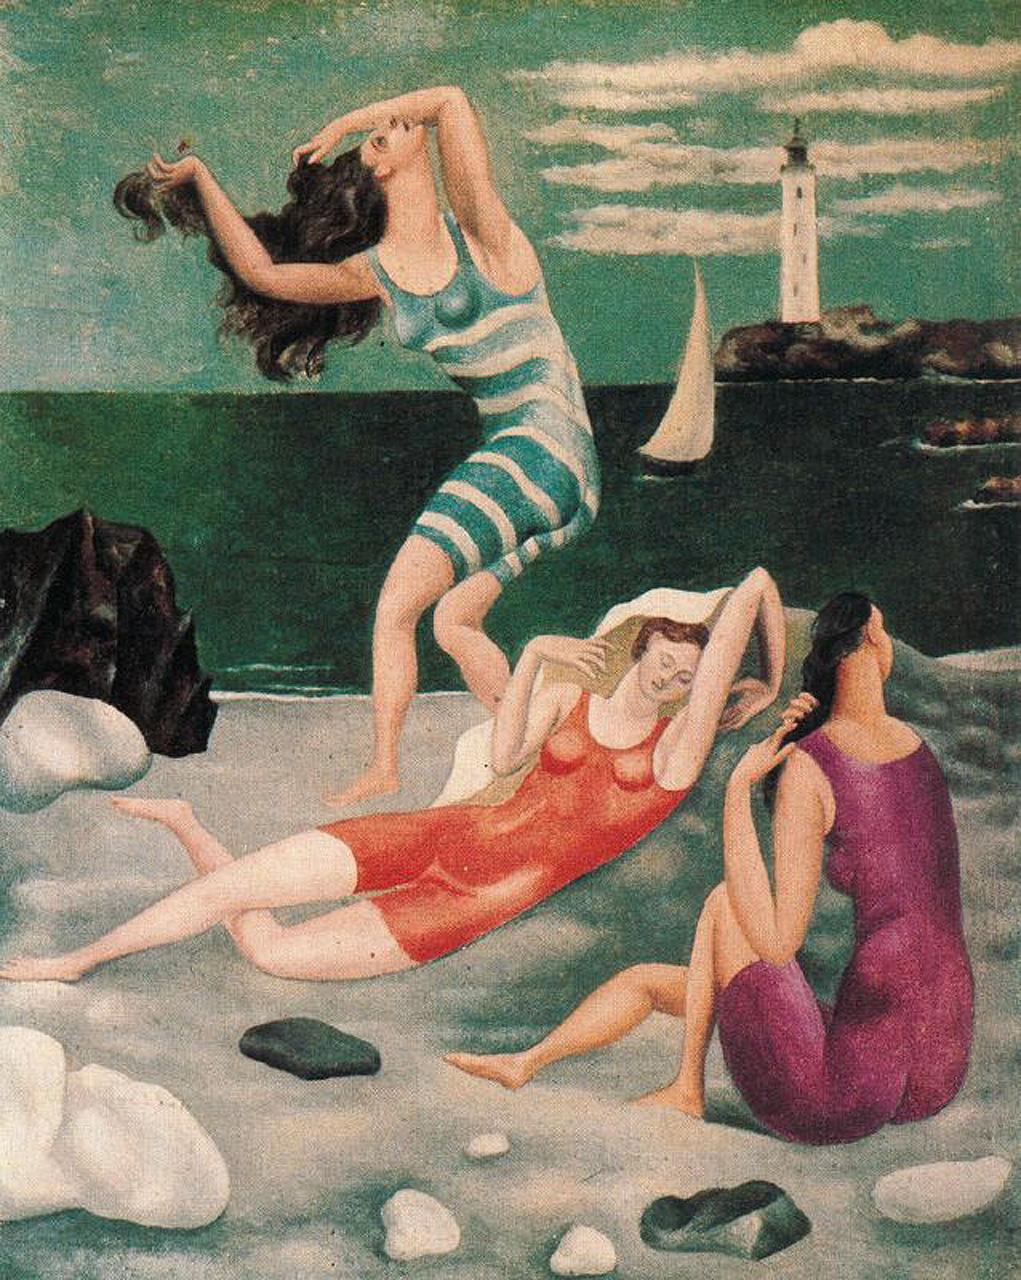 Bathers, 1918